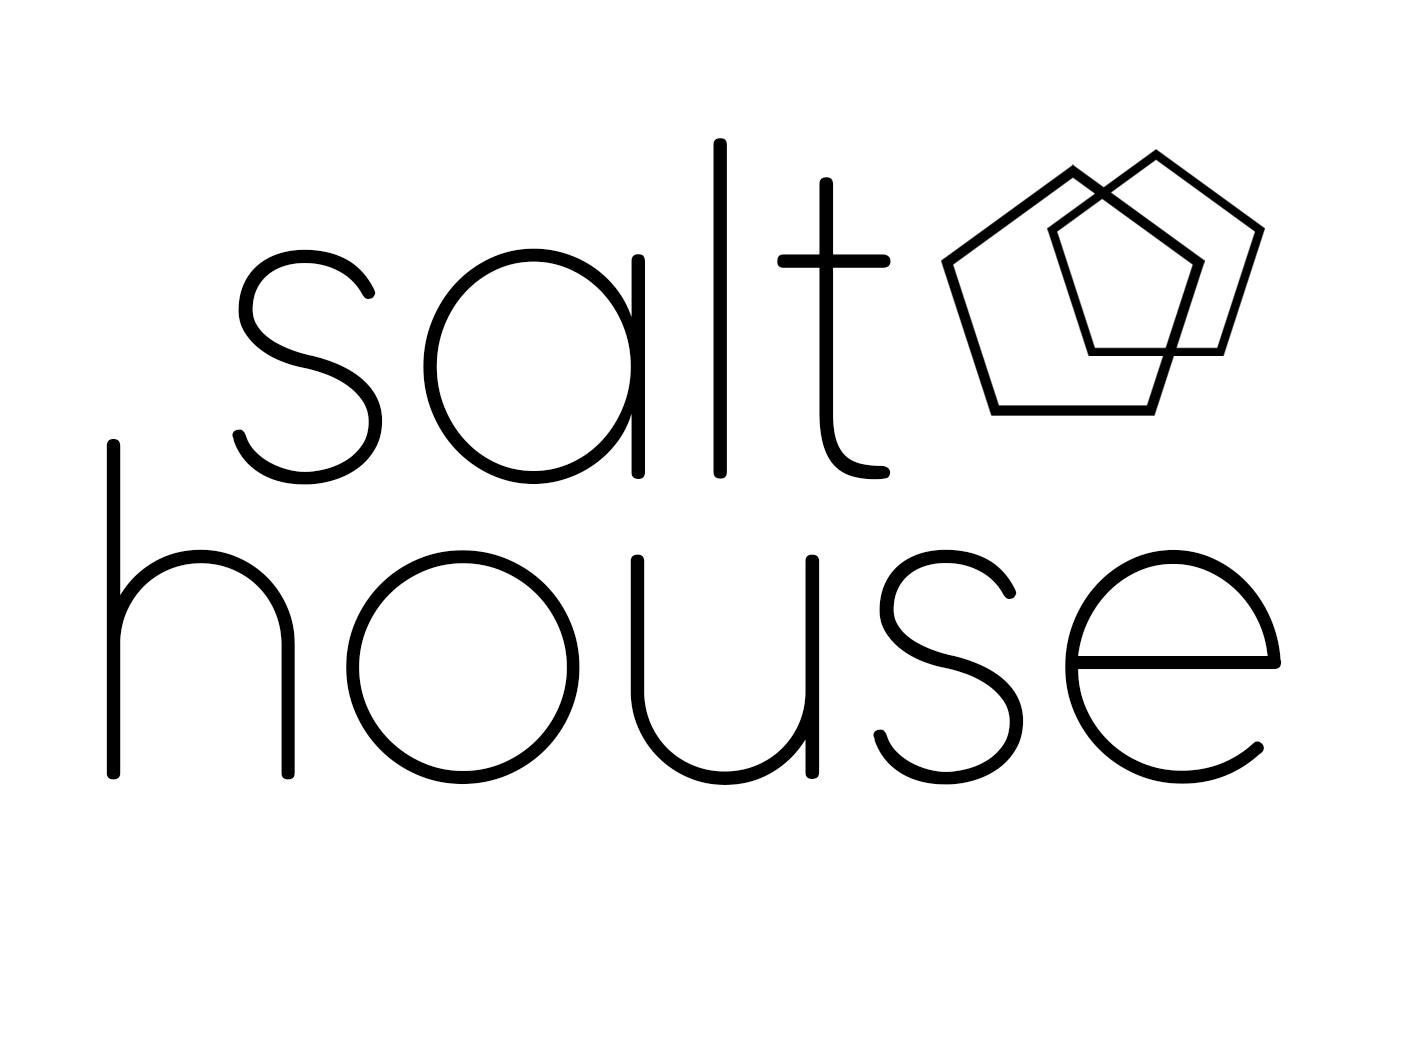 SALT-HOUSE-LOGO-FINAL.jpg